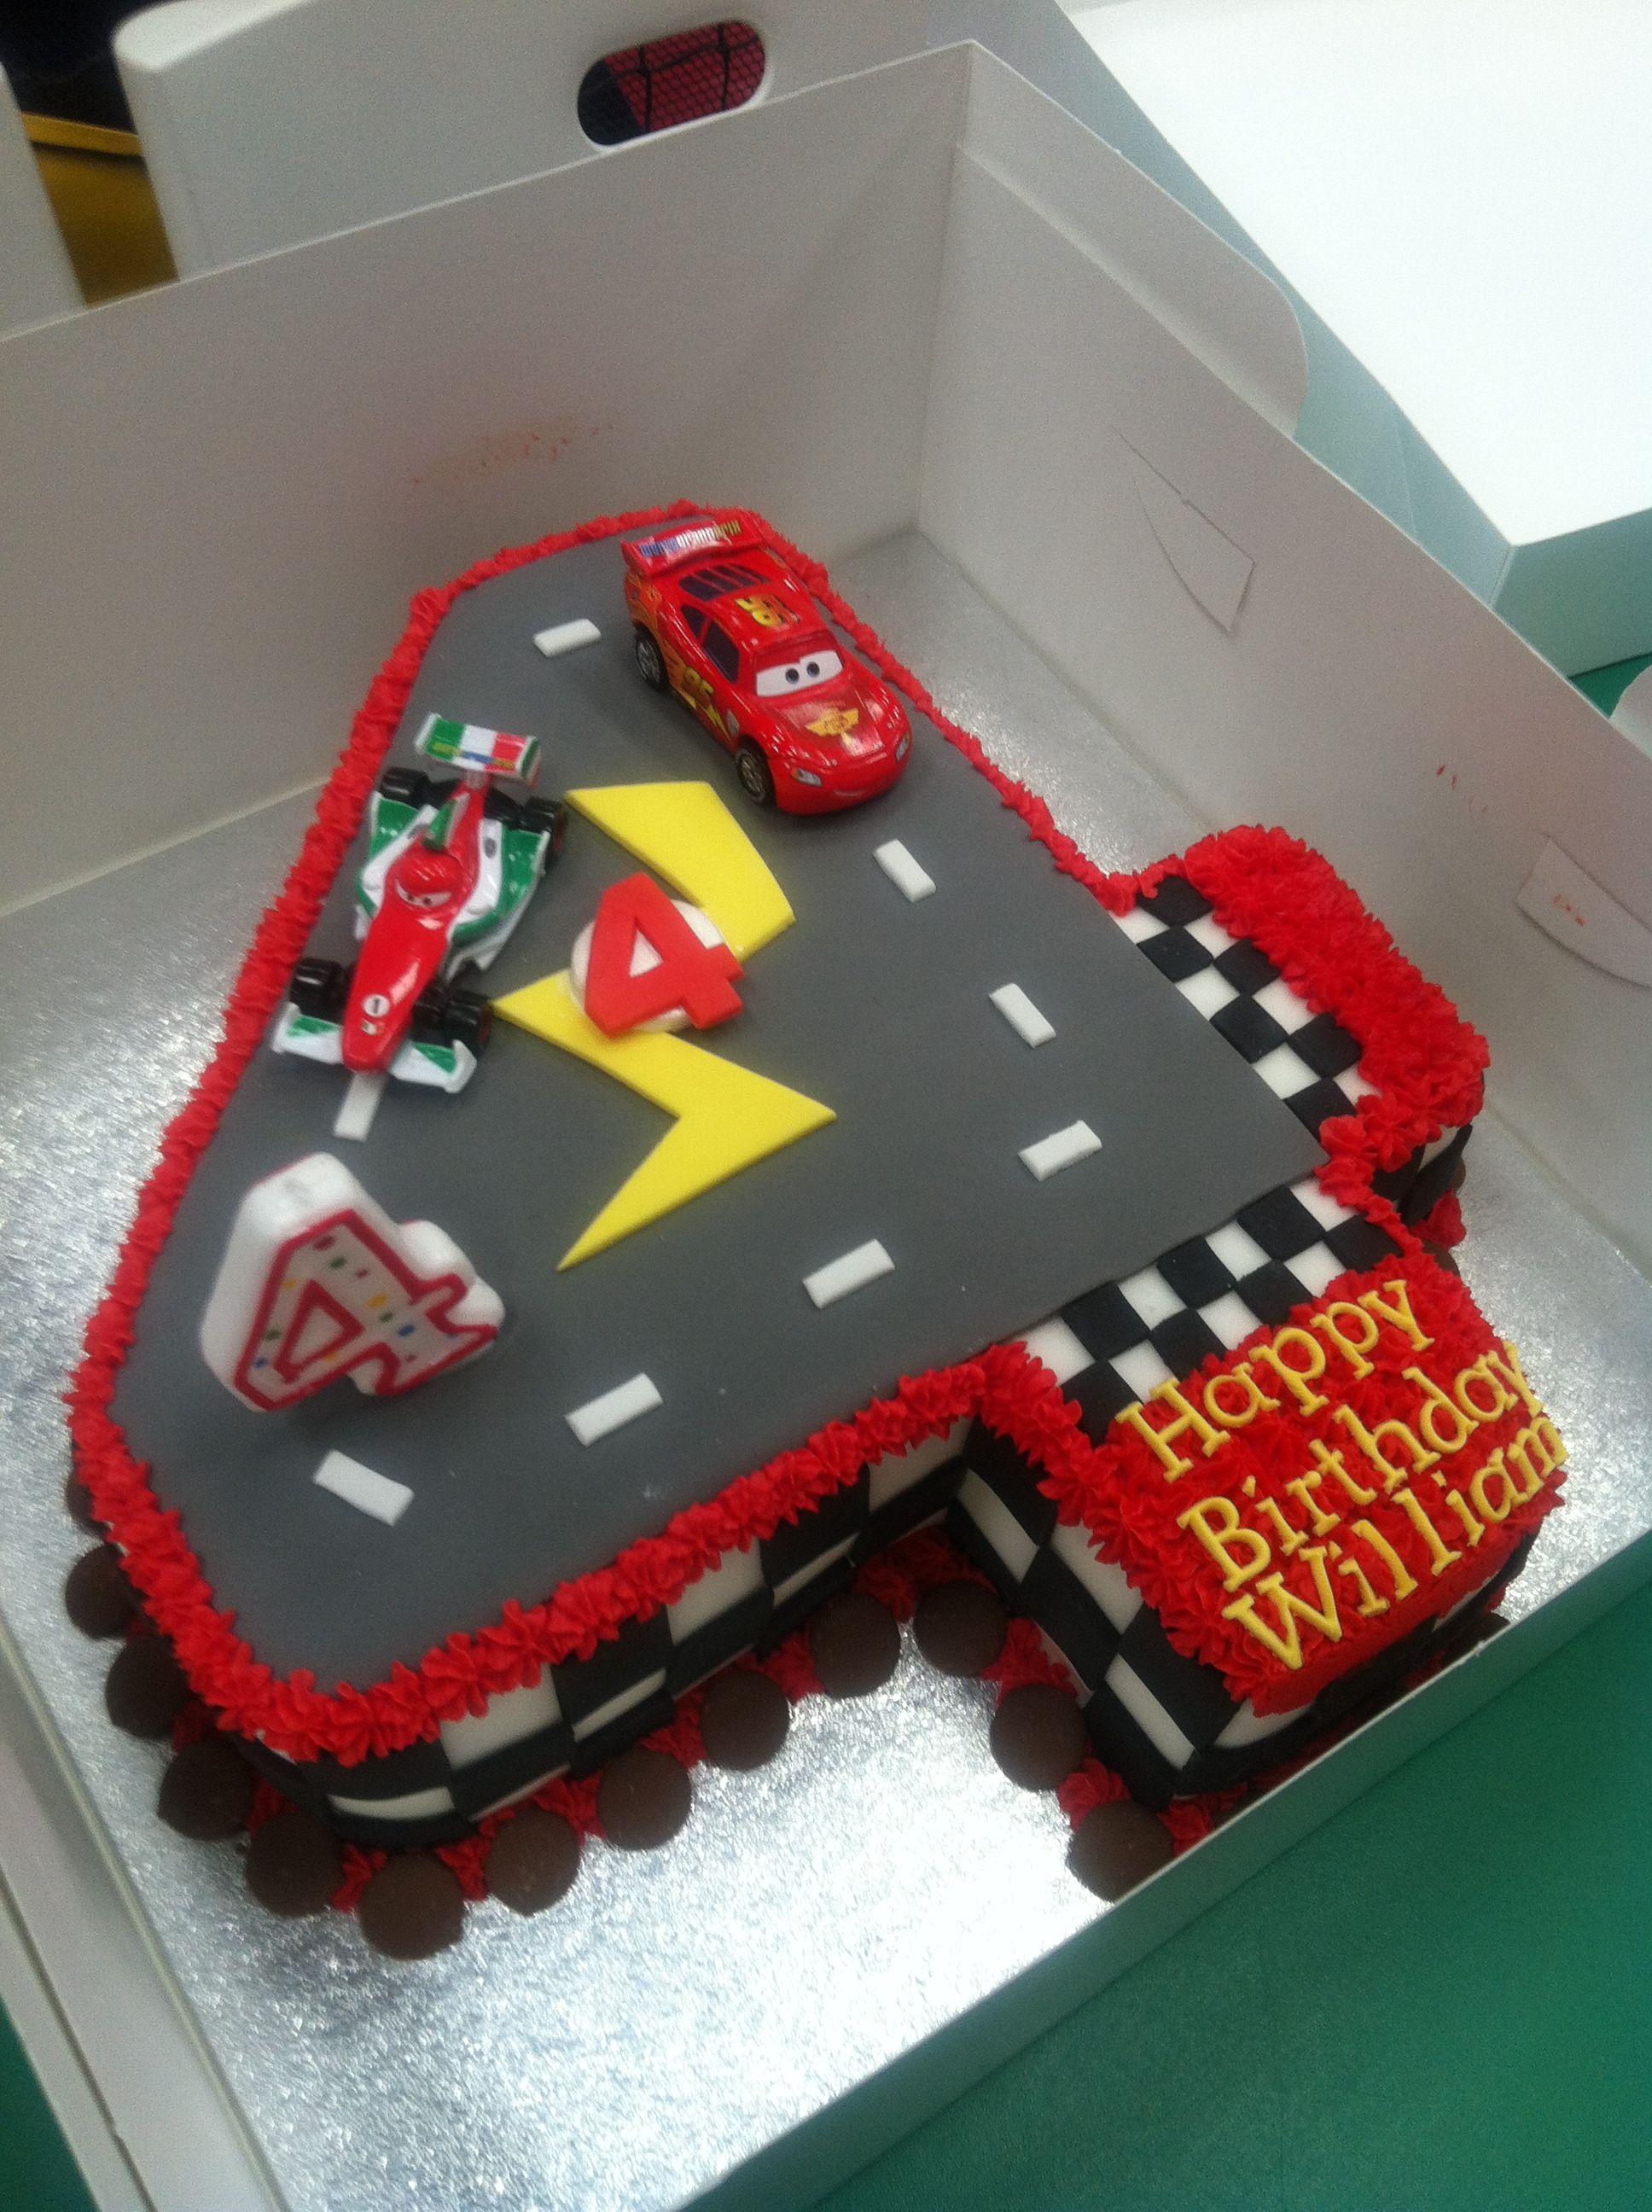 Williams 4th Birthday Cake Birthday cakes Birthdays and Xbox cake